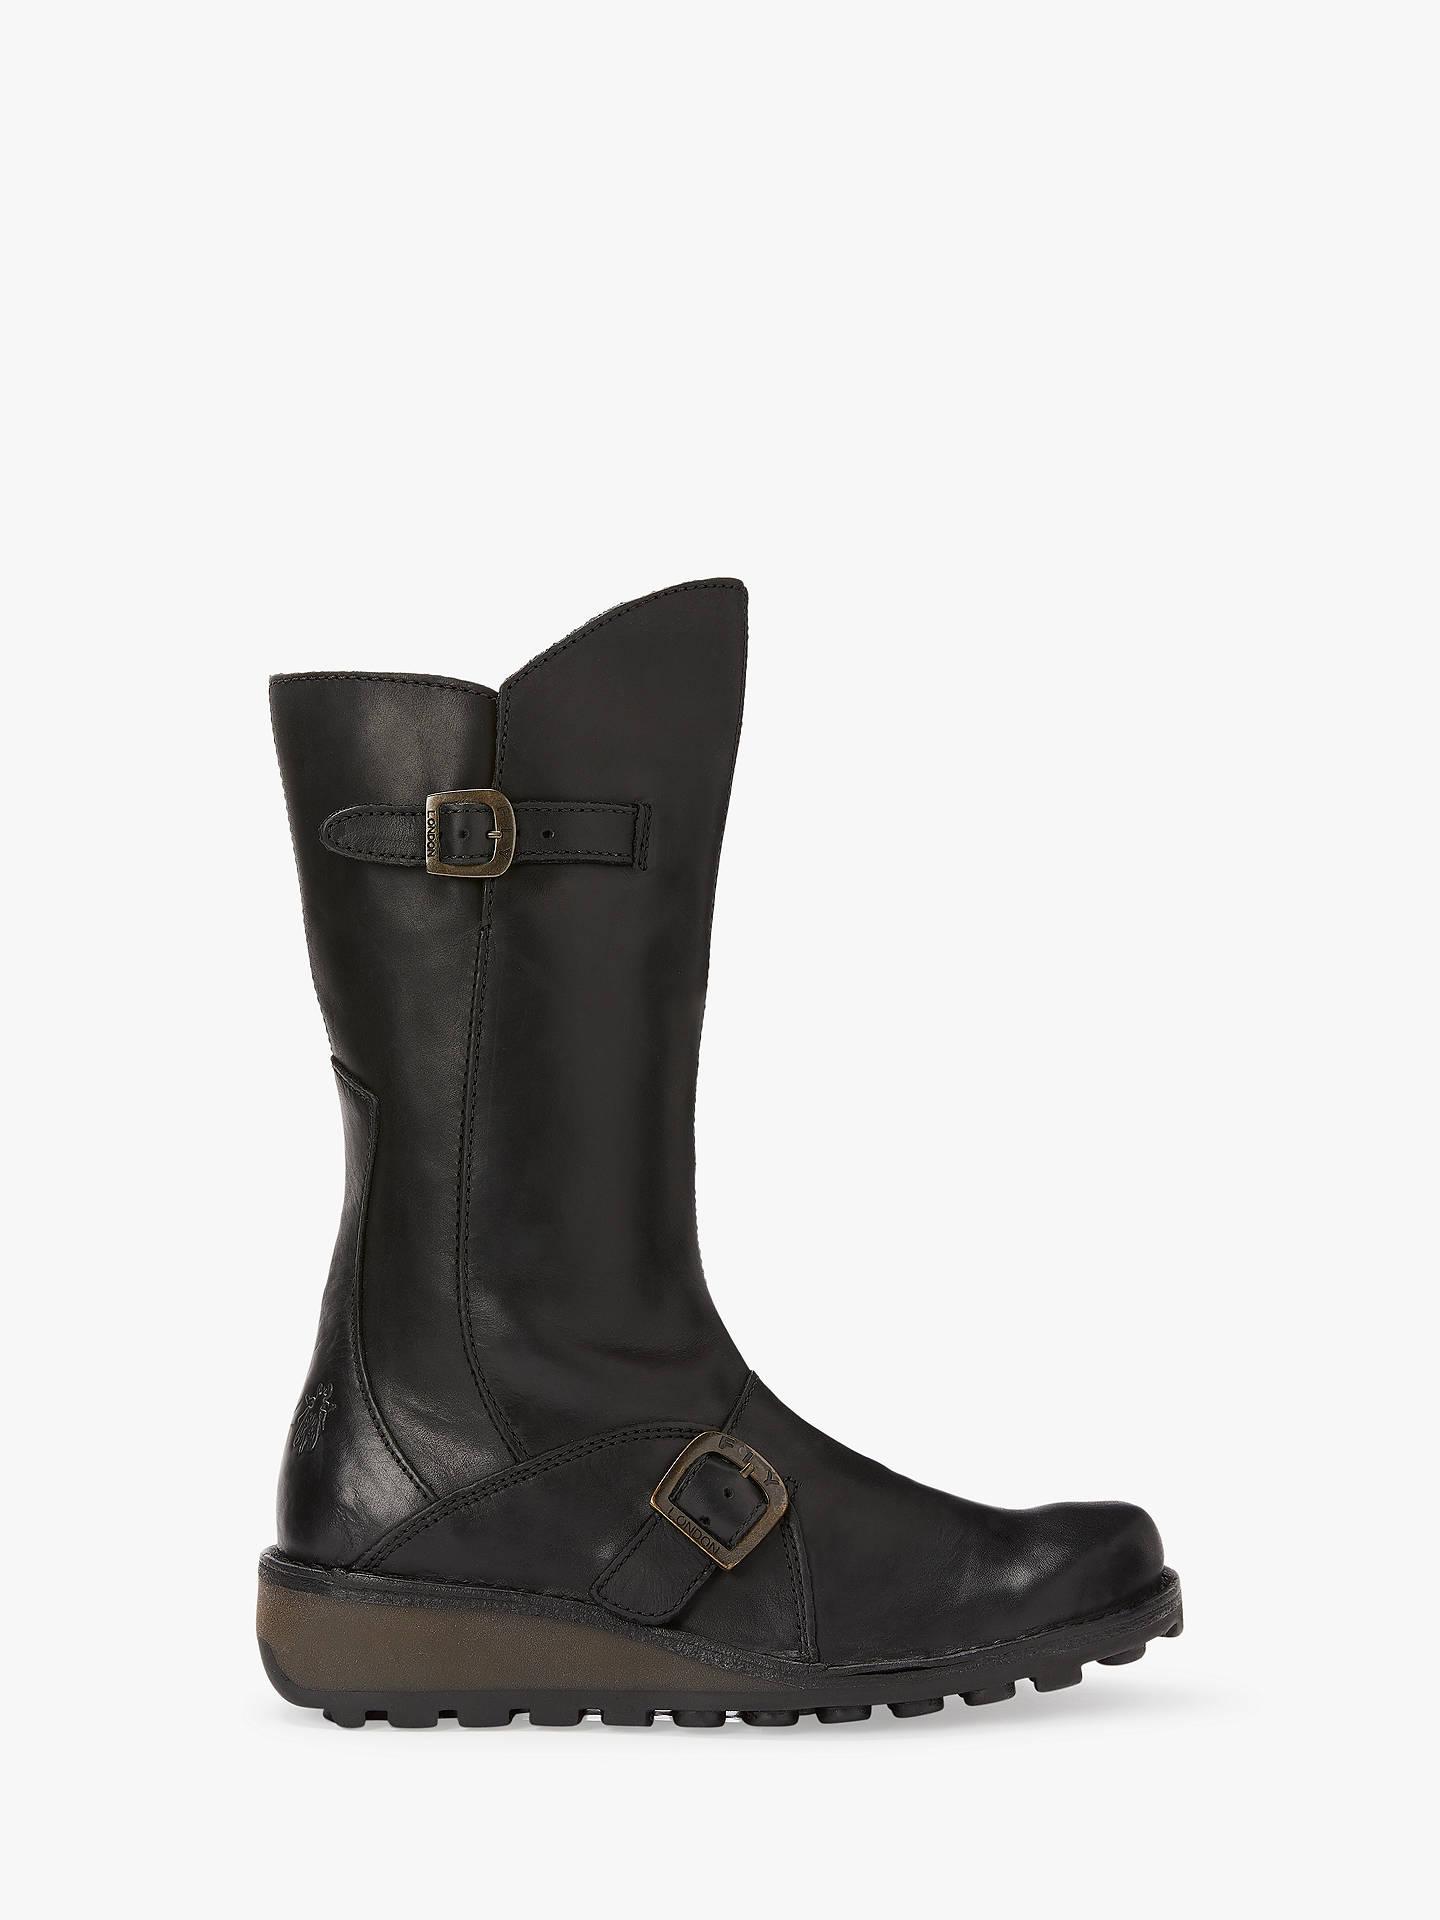 c83d97d428b Fly London Mes Wedge Heel Calf Boots at John Lewis & Partners